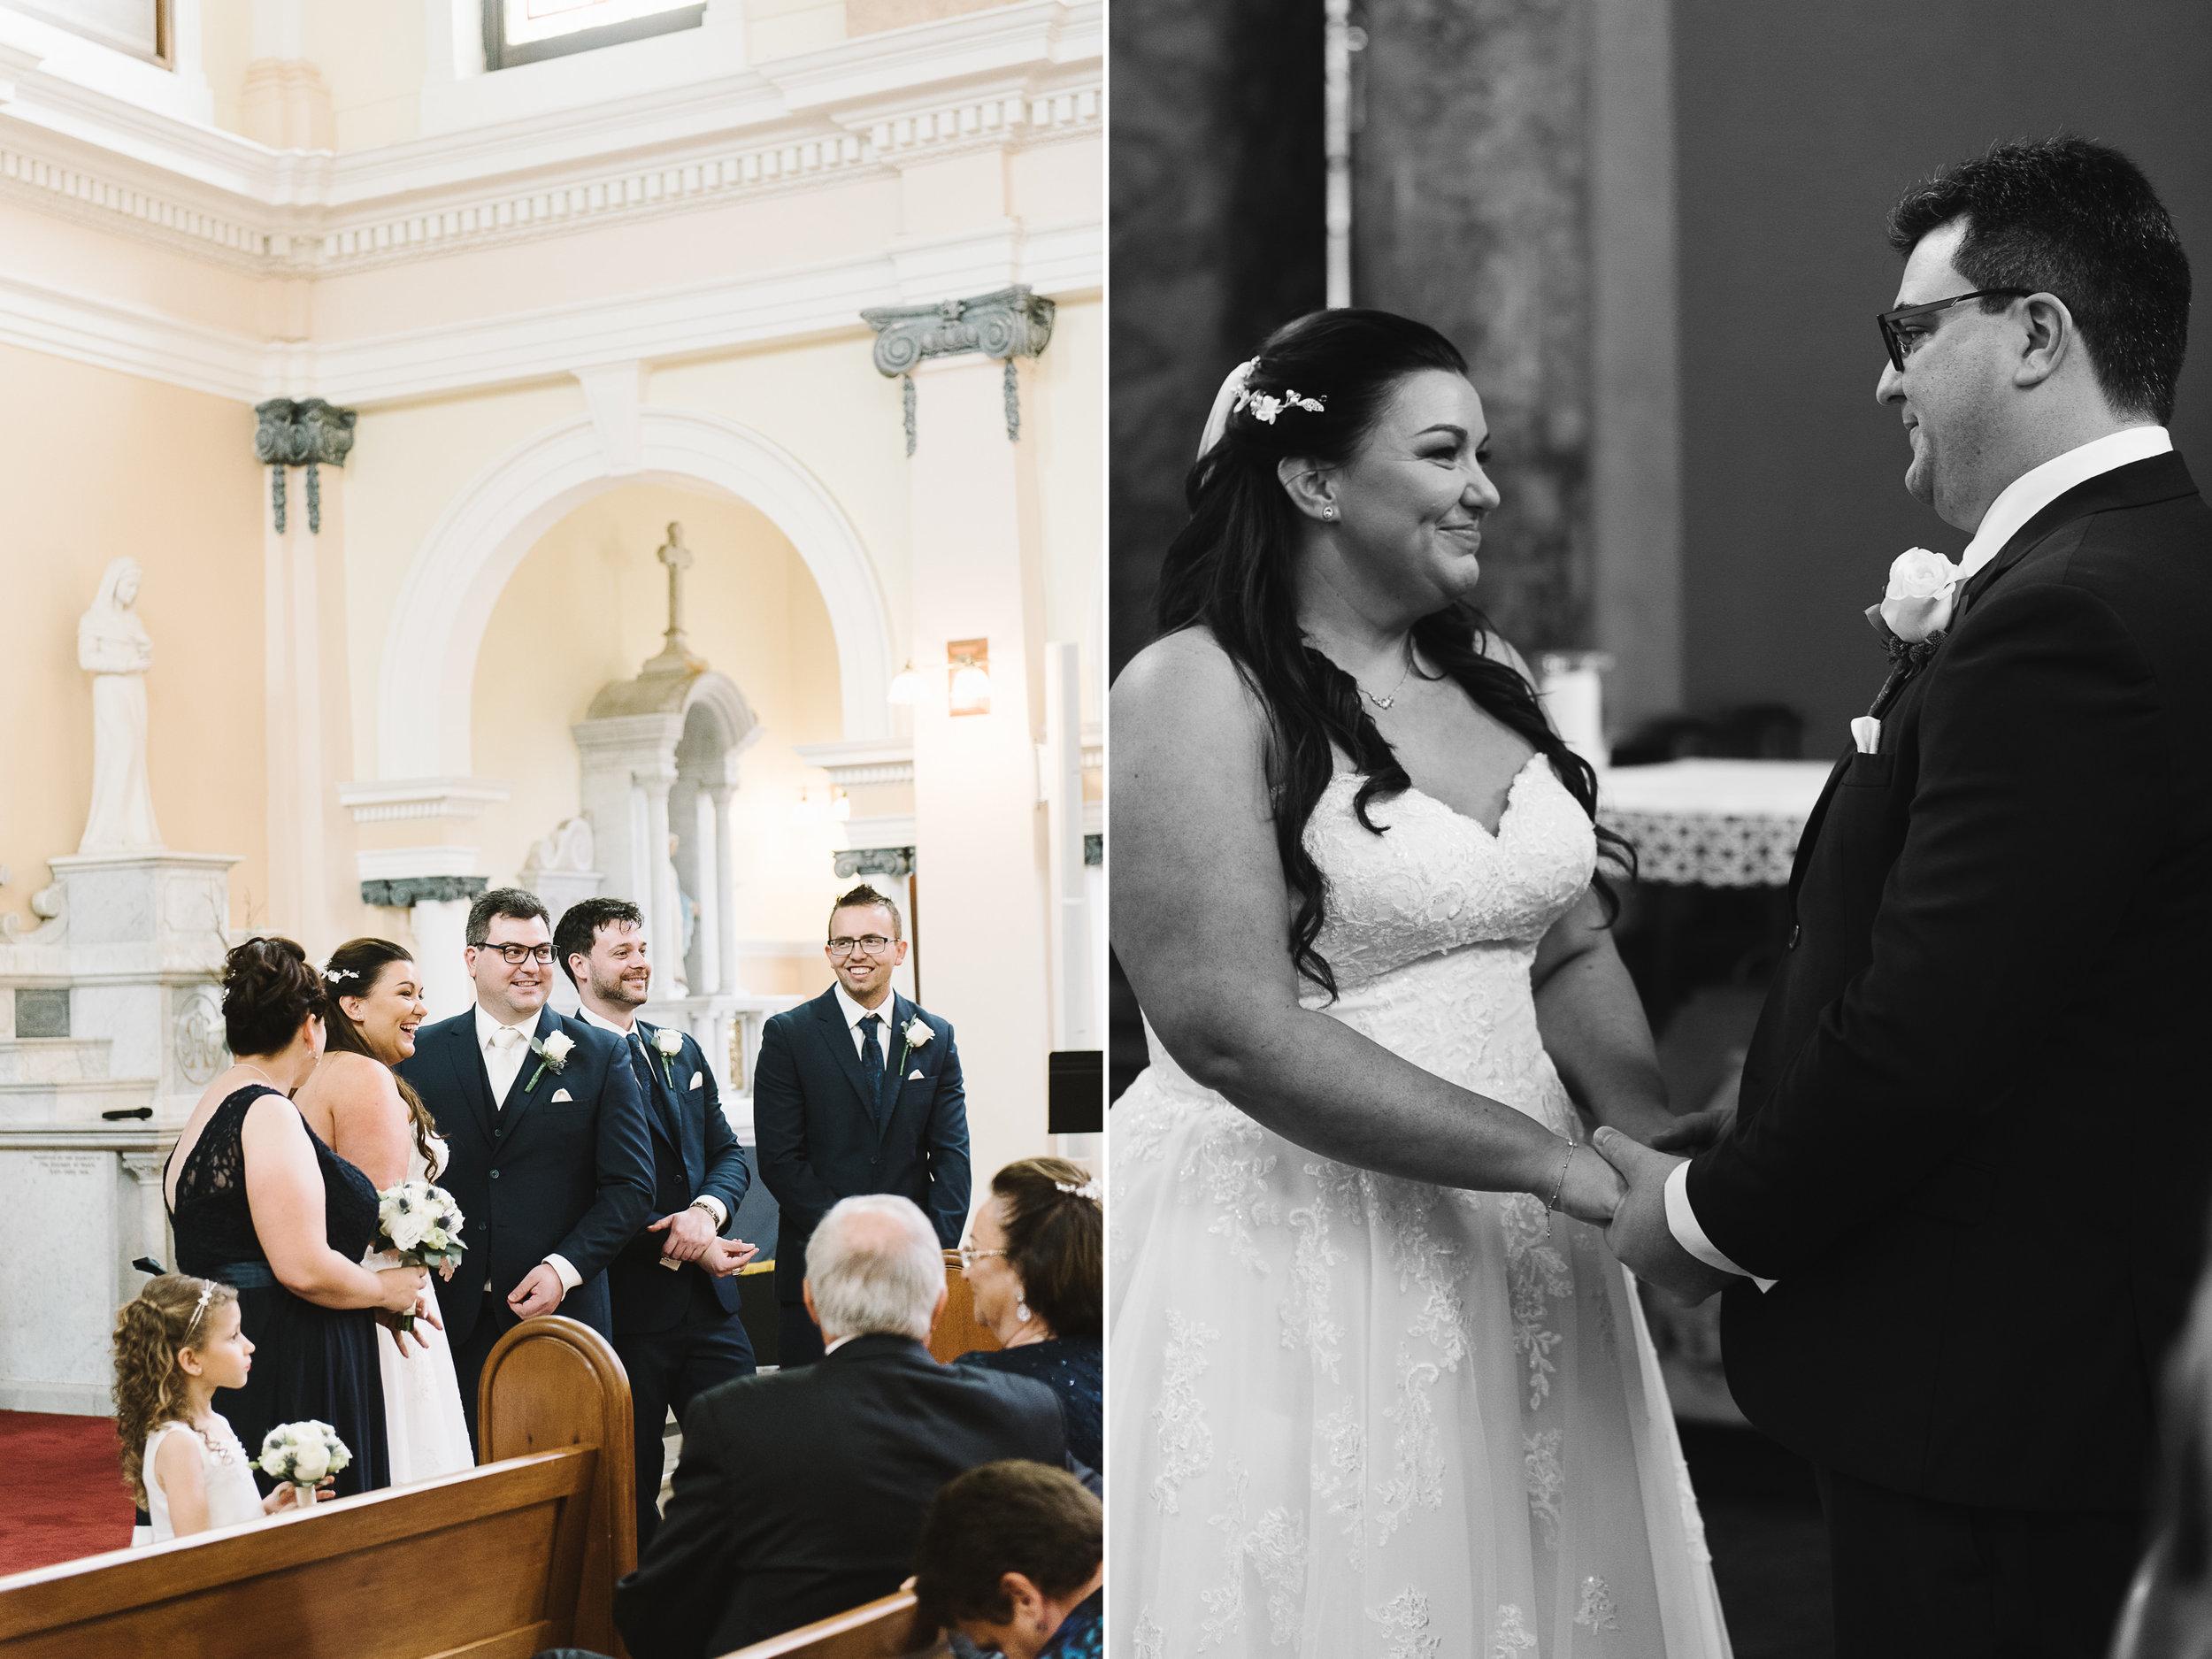 nudgee-college-wedding-21.jpg